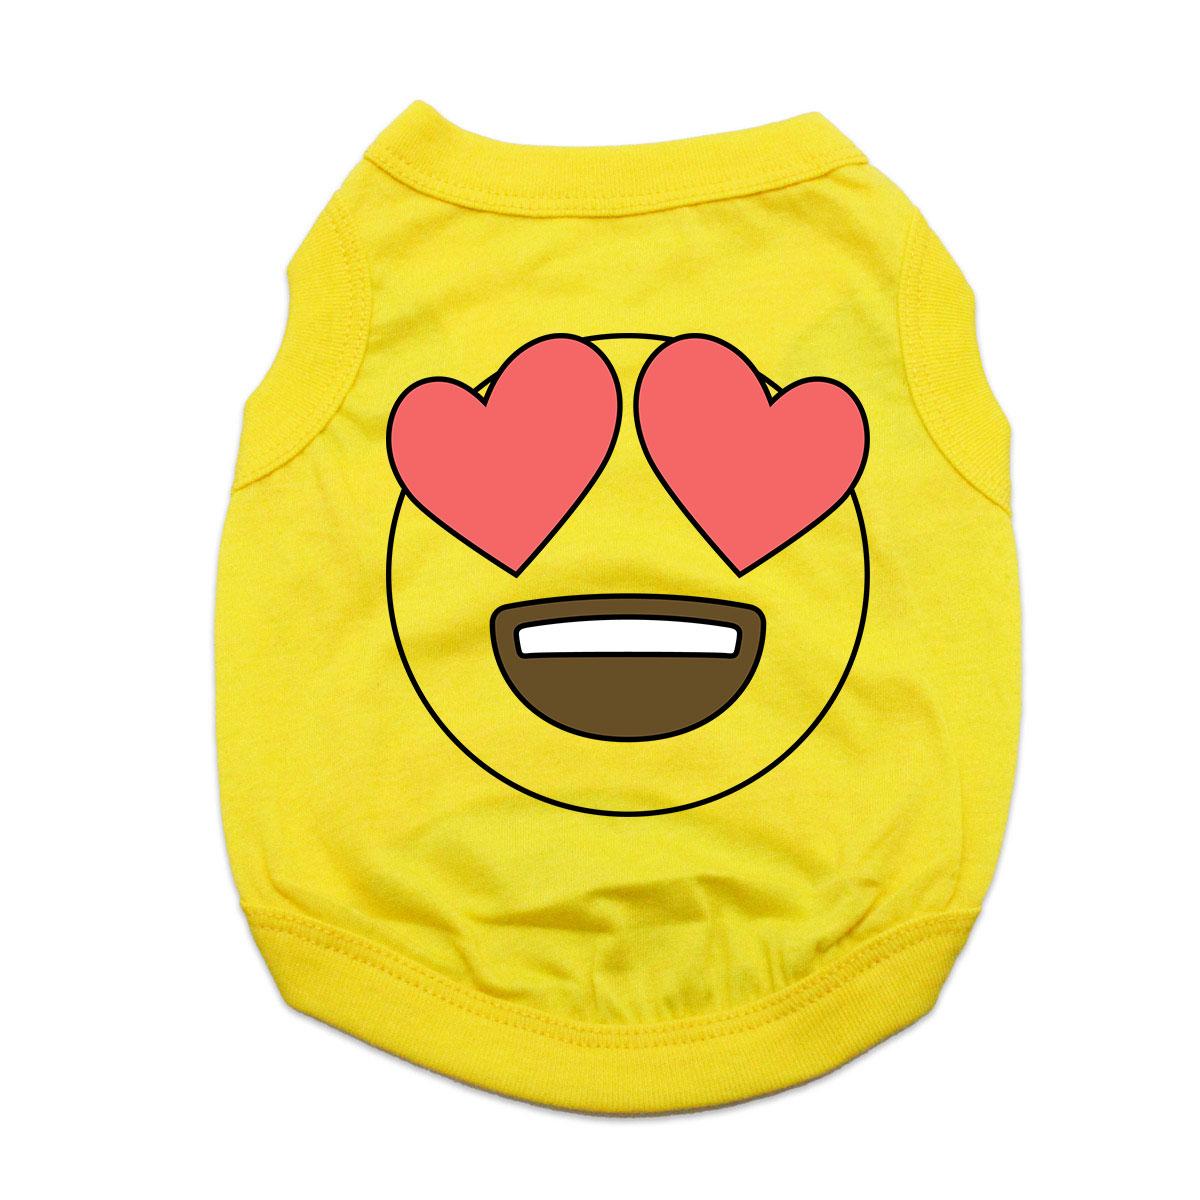 Heart Eyes Emoji Dog Shirt - Yellow